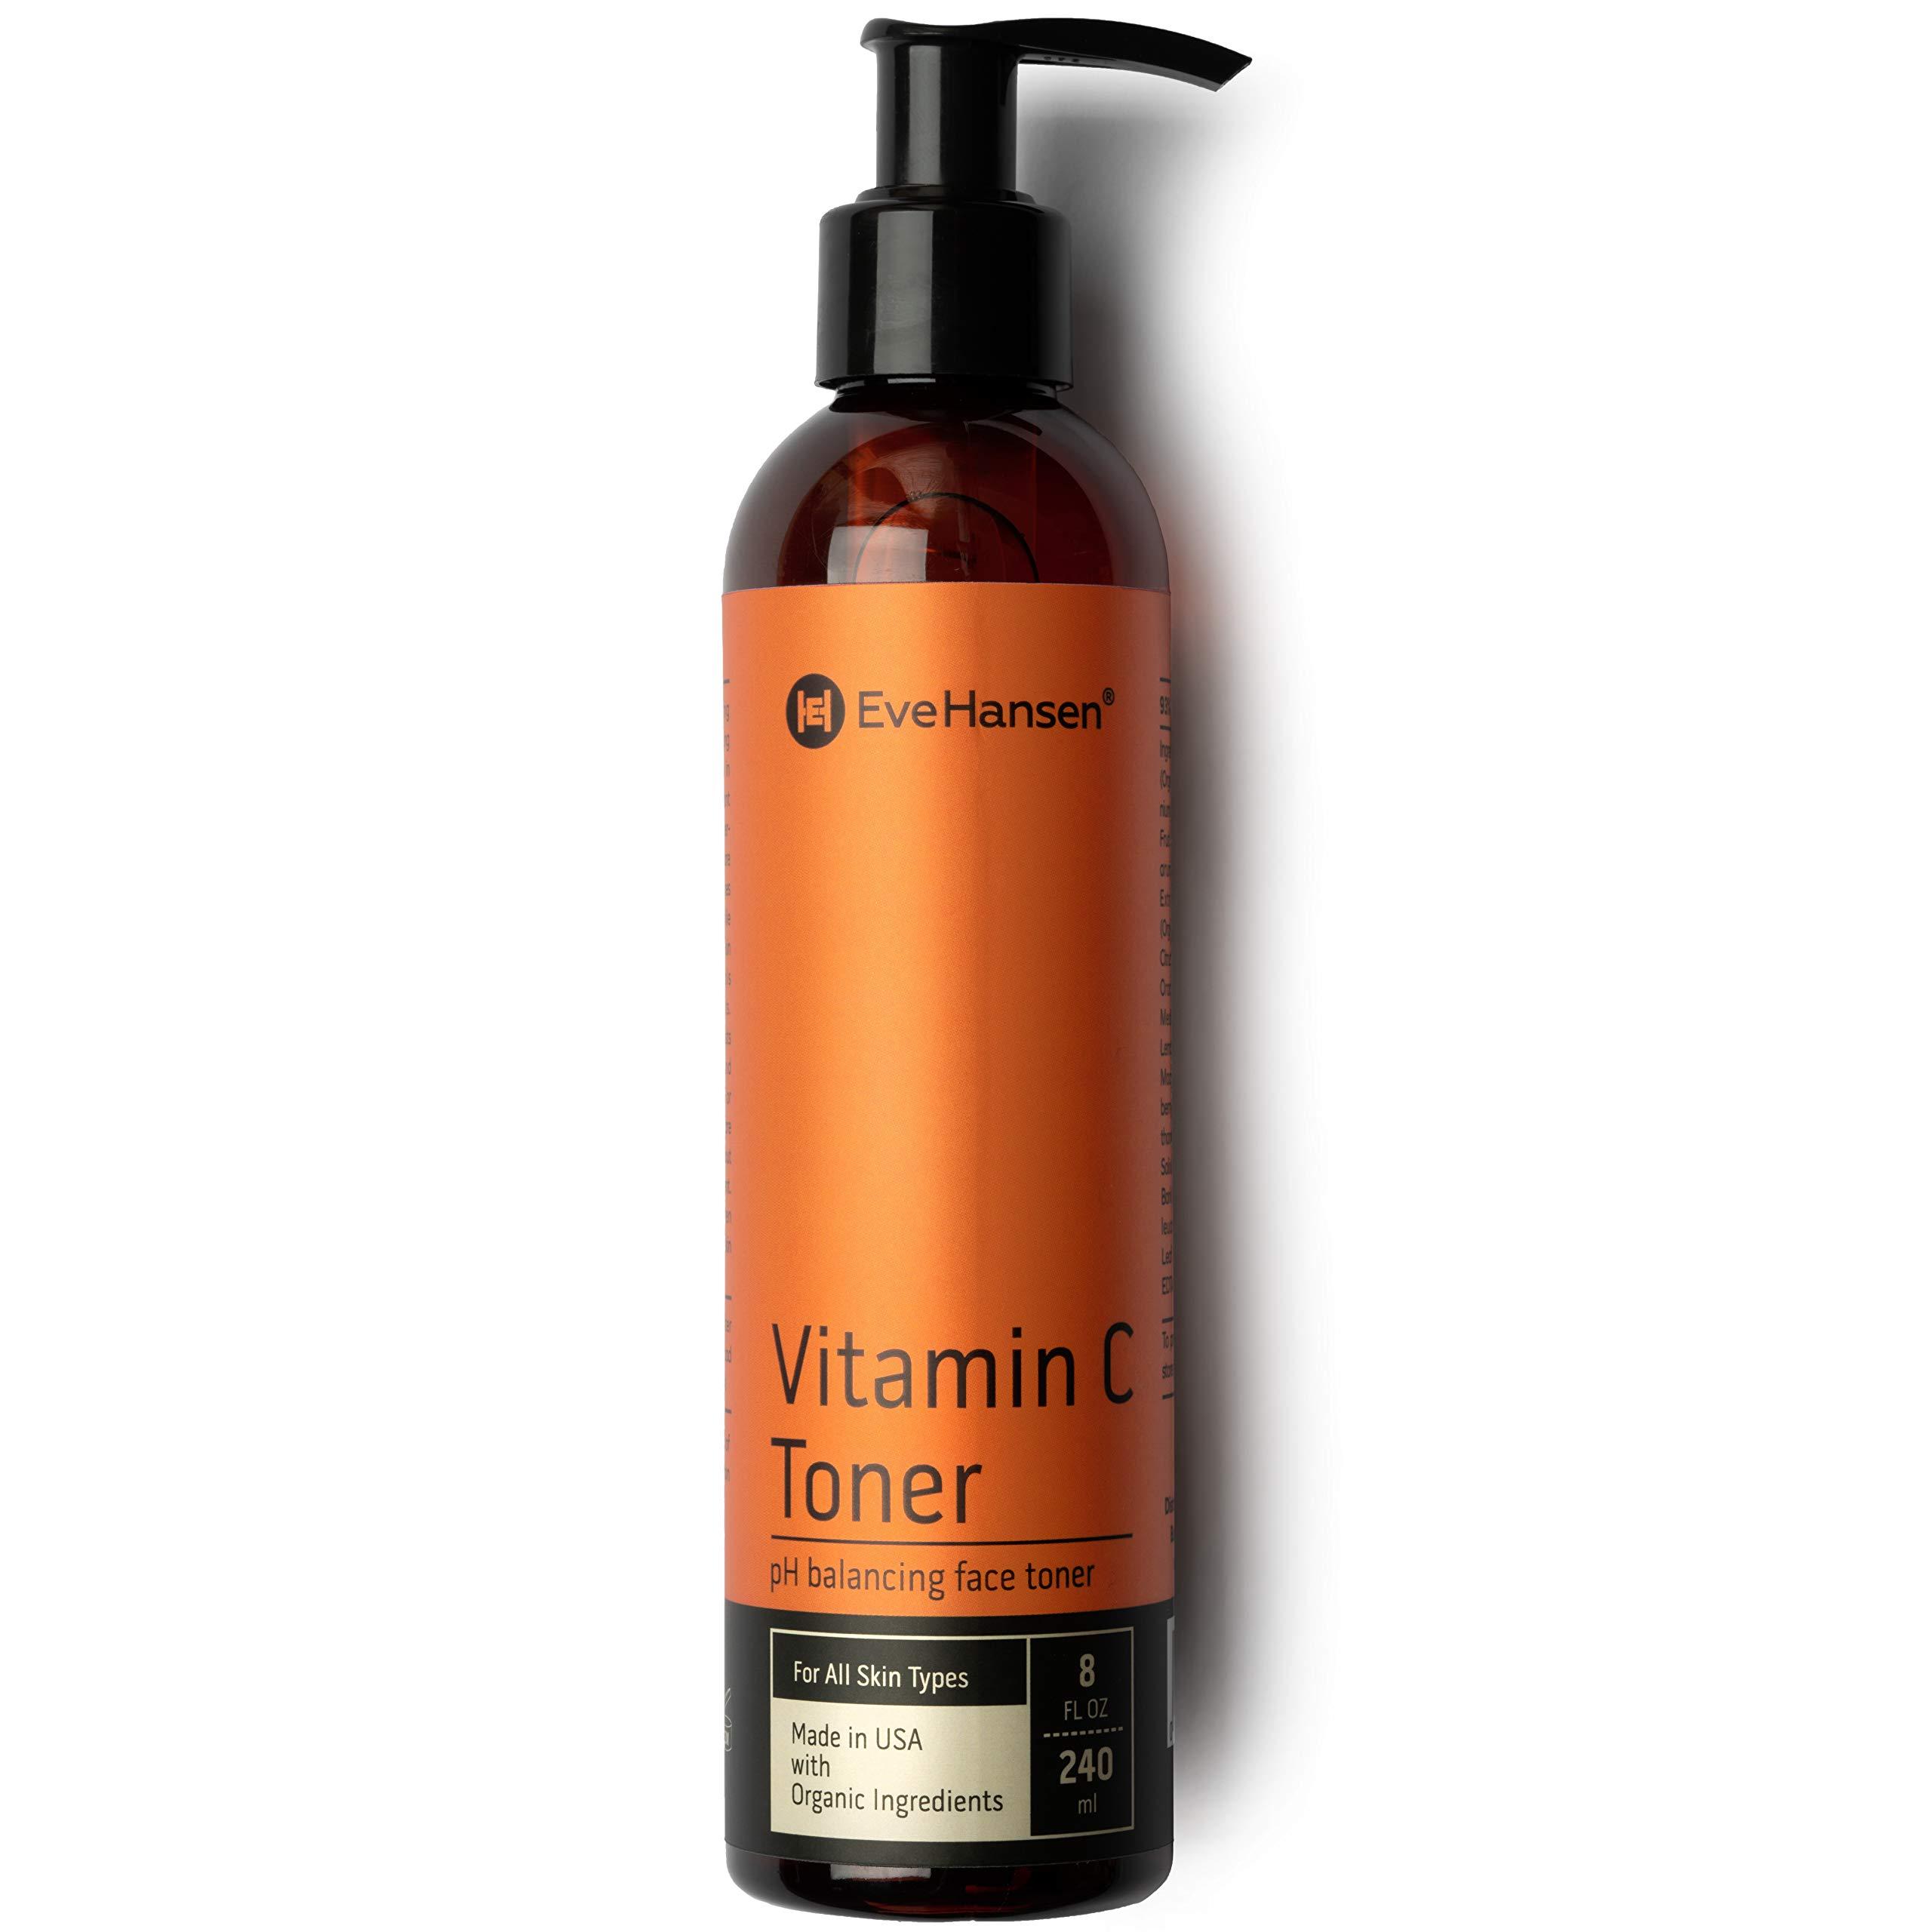 Eve Hansen Vitamin C Toner for face   8 oz Hydrating Facial Toner & PH Balancing Pore Minimizer with Anti Aging Aloe, Citric Acid & Tea Tree   Skin & Face Toner for All Skin Types & Even, Clear Skin